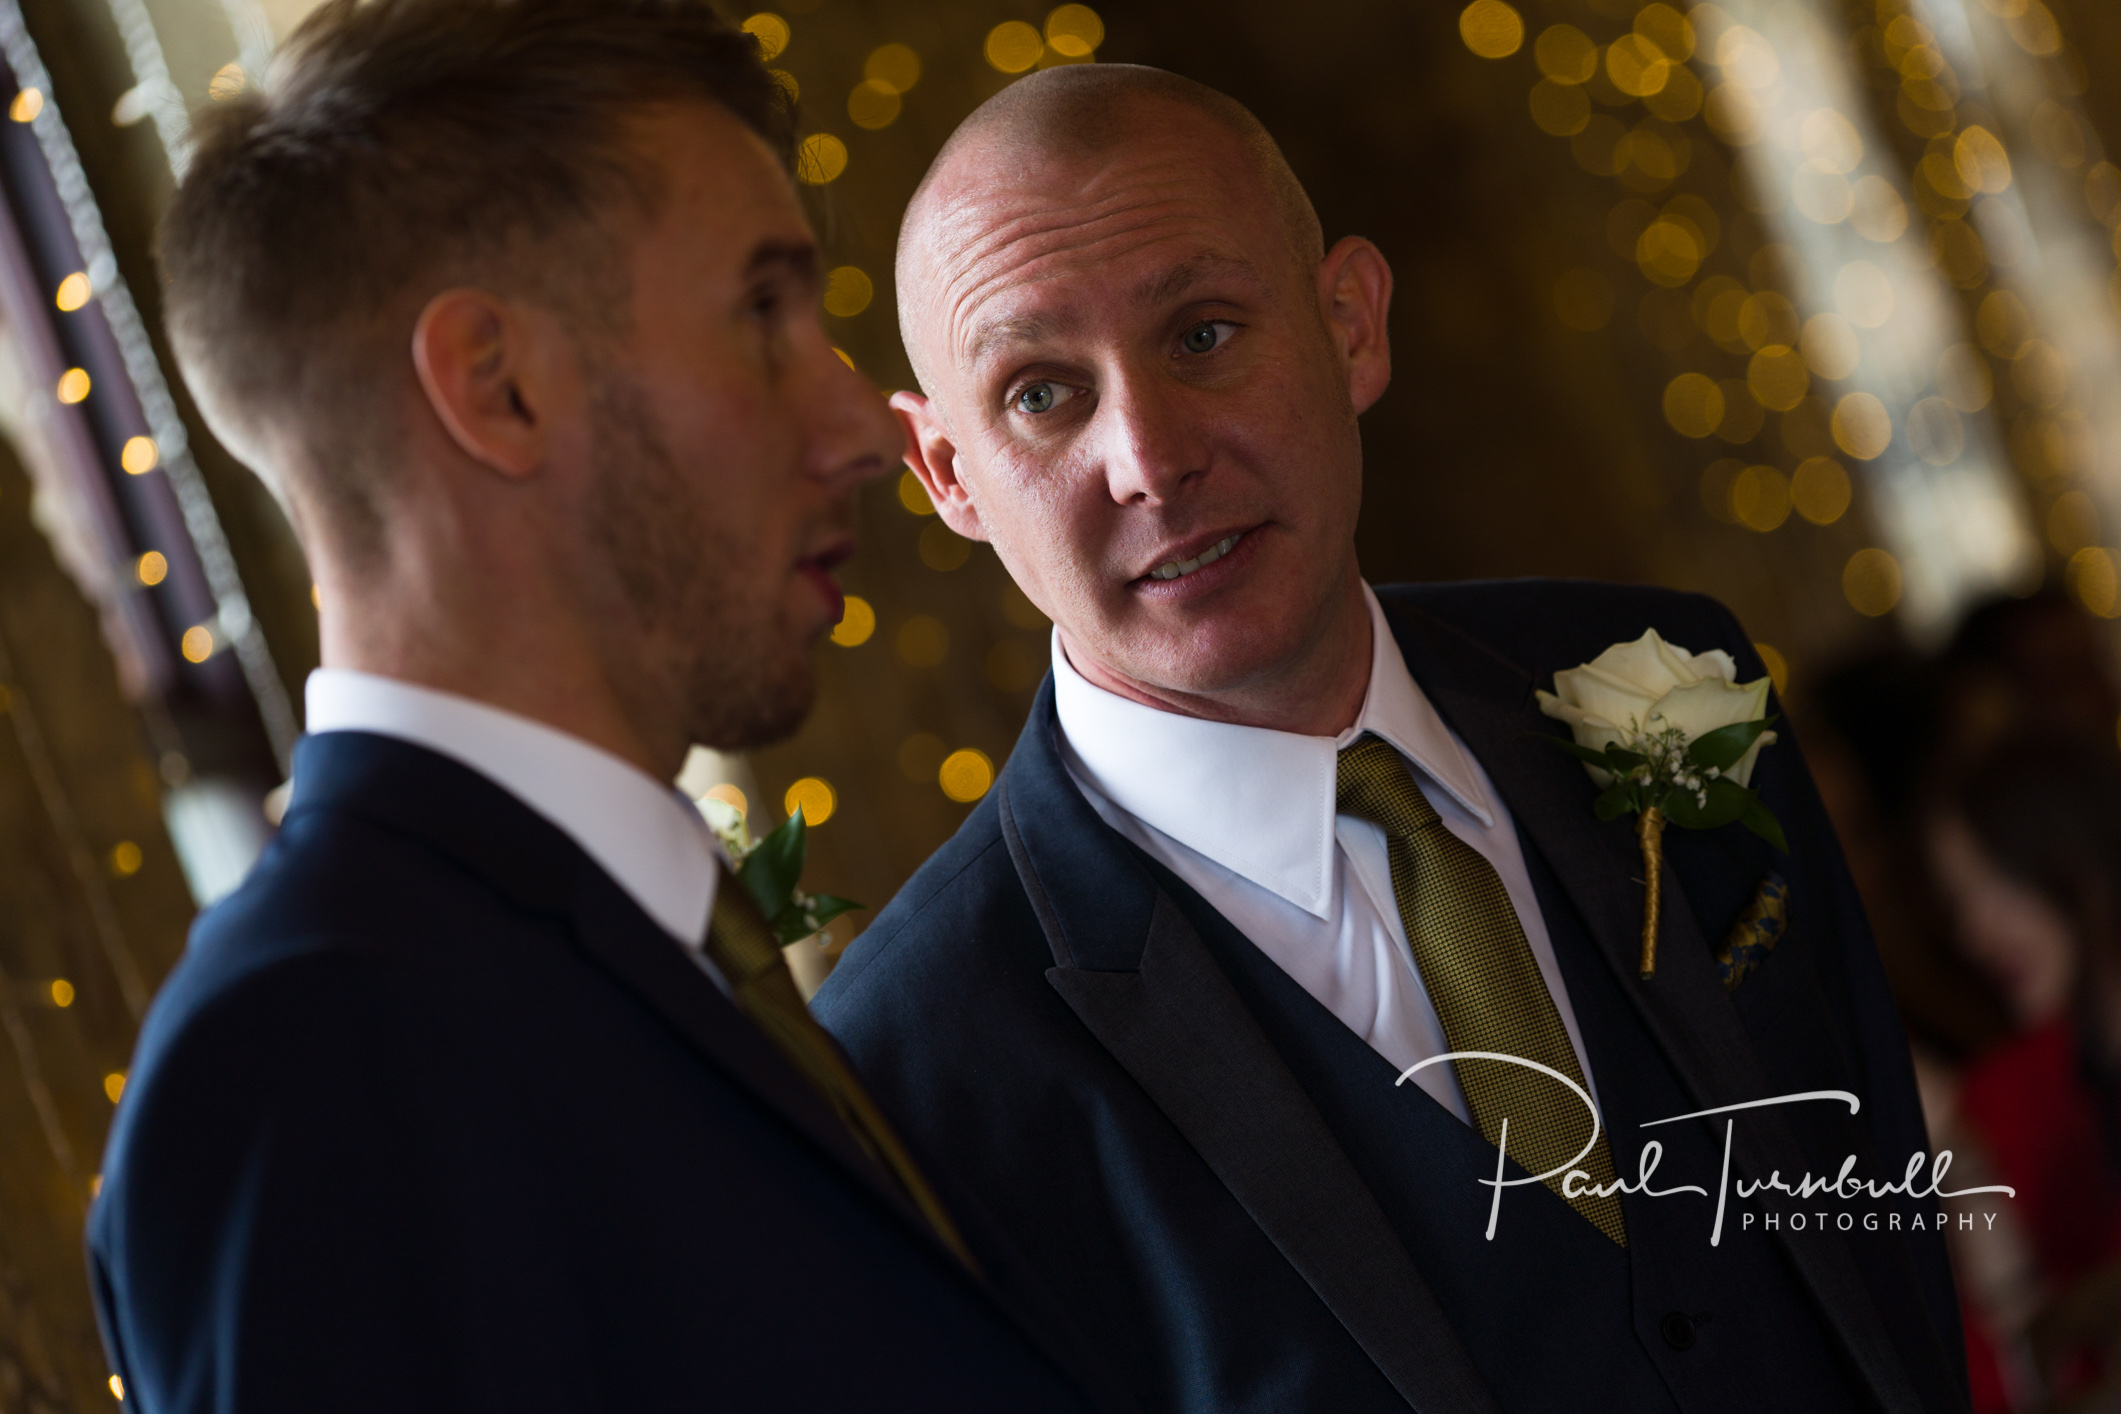 wedding-photographer-raven-hall-ravenscroft--scarborough-yorkshire-lucy-ryan-029.jpg